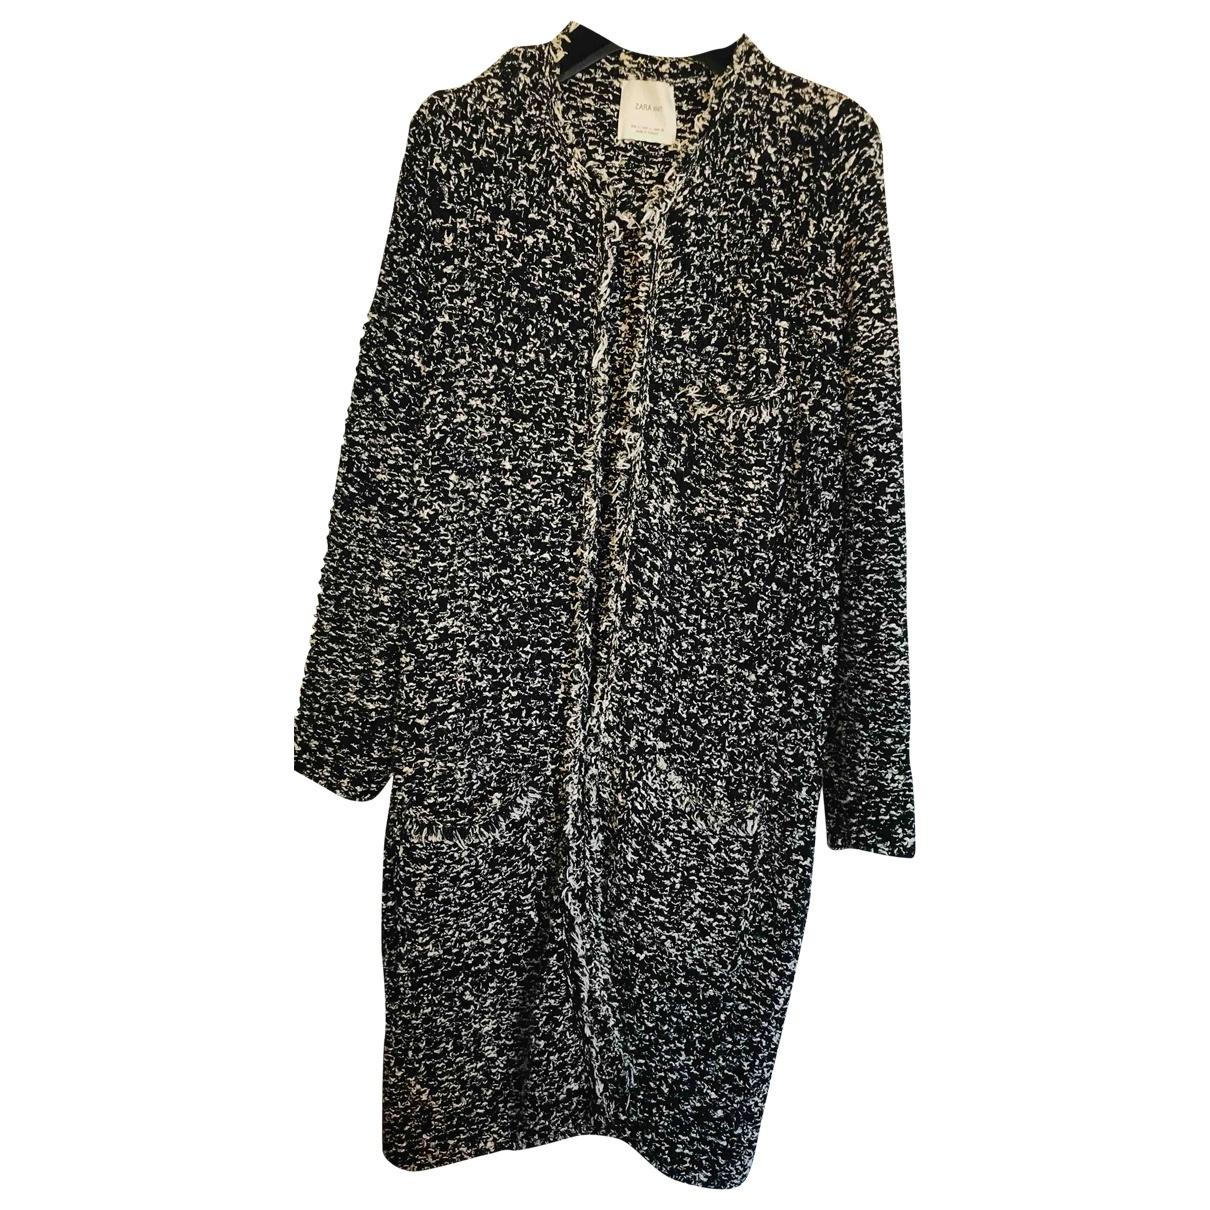 Zara - Manteau   pour femme en tweed - noir